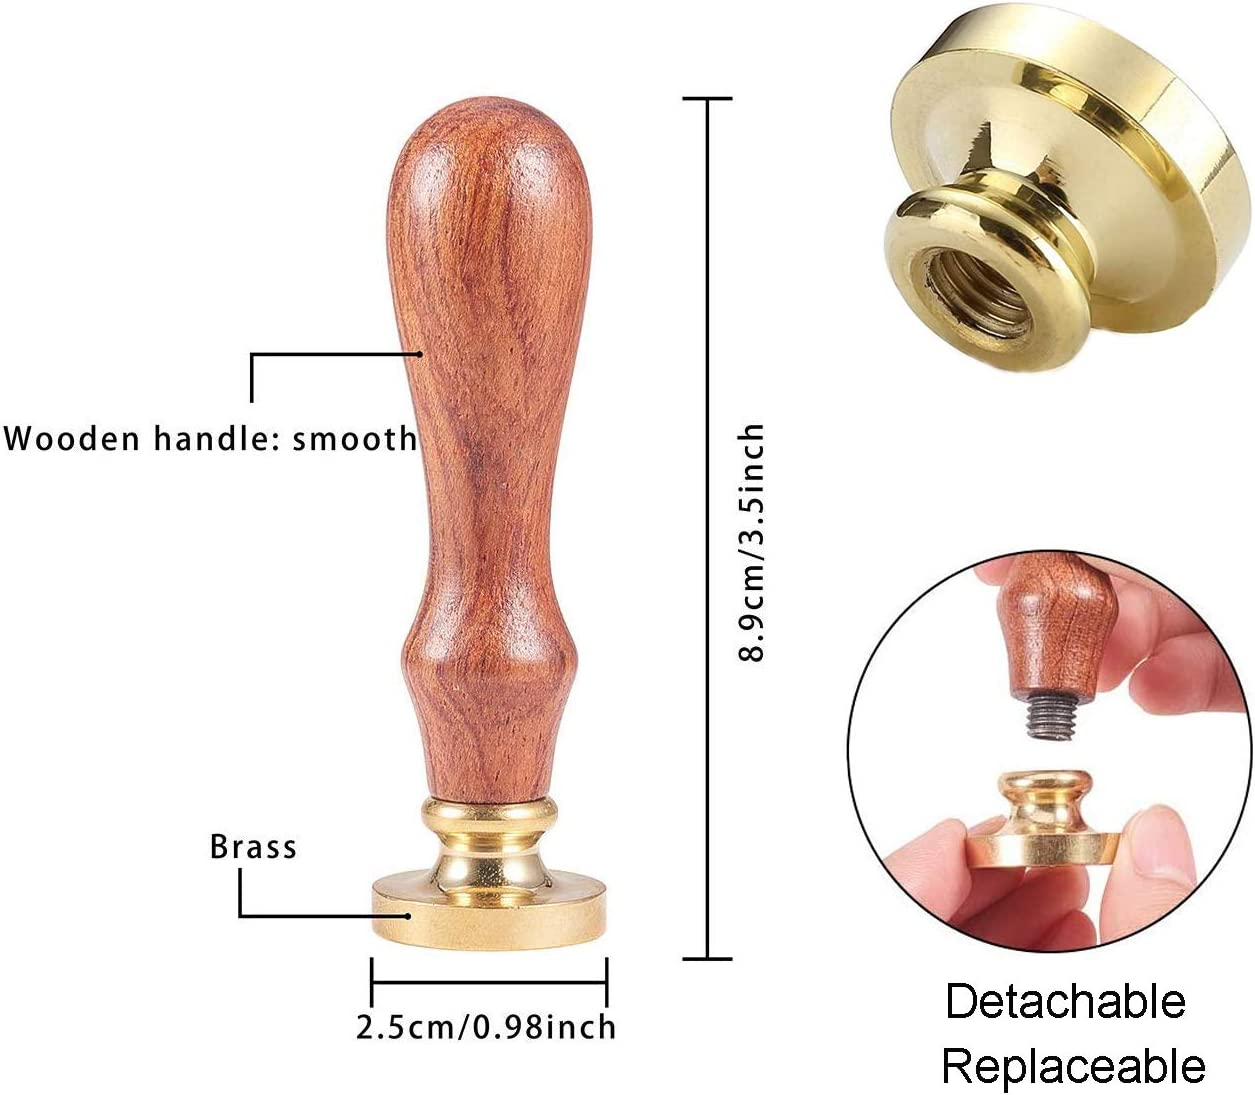 Jahrgang Wachssiegelstempel Libelle Retro Holzstempel Abnehmbar Messingkopf 25 mm F/ür Hochzeit Umschl/äge Einladungen Versch/önerung JEWELEADER Wachs-Siegel-Stempel